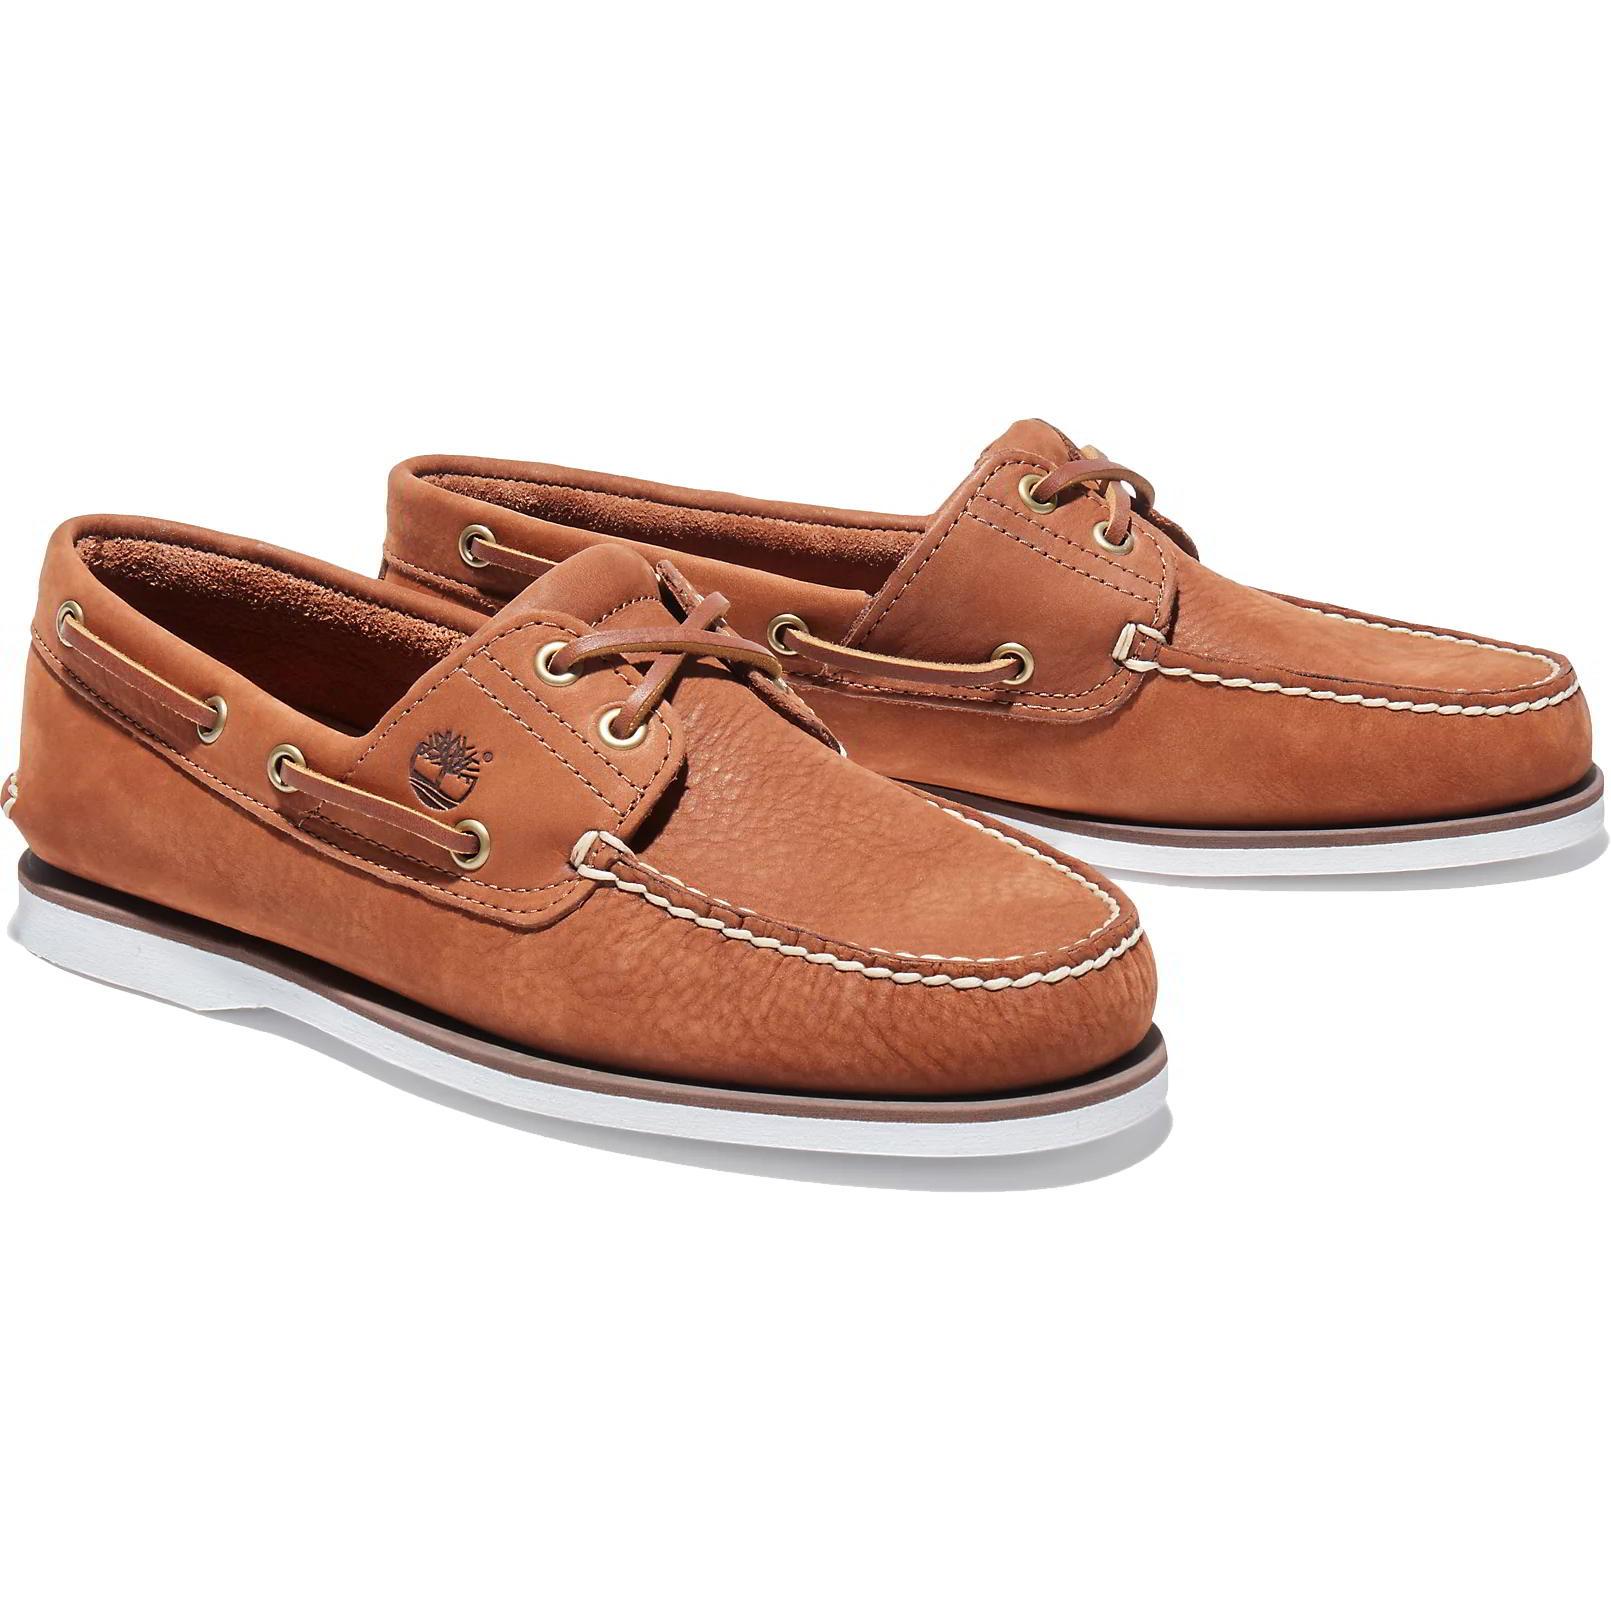 Timberland Mens Classic Boat Shoe - Rust - A43V1